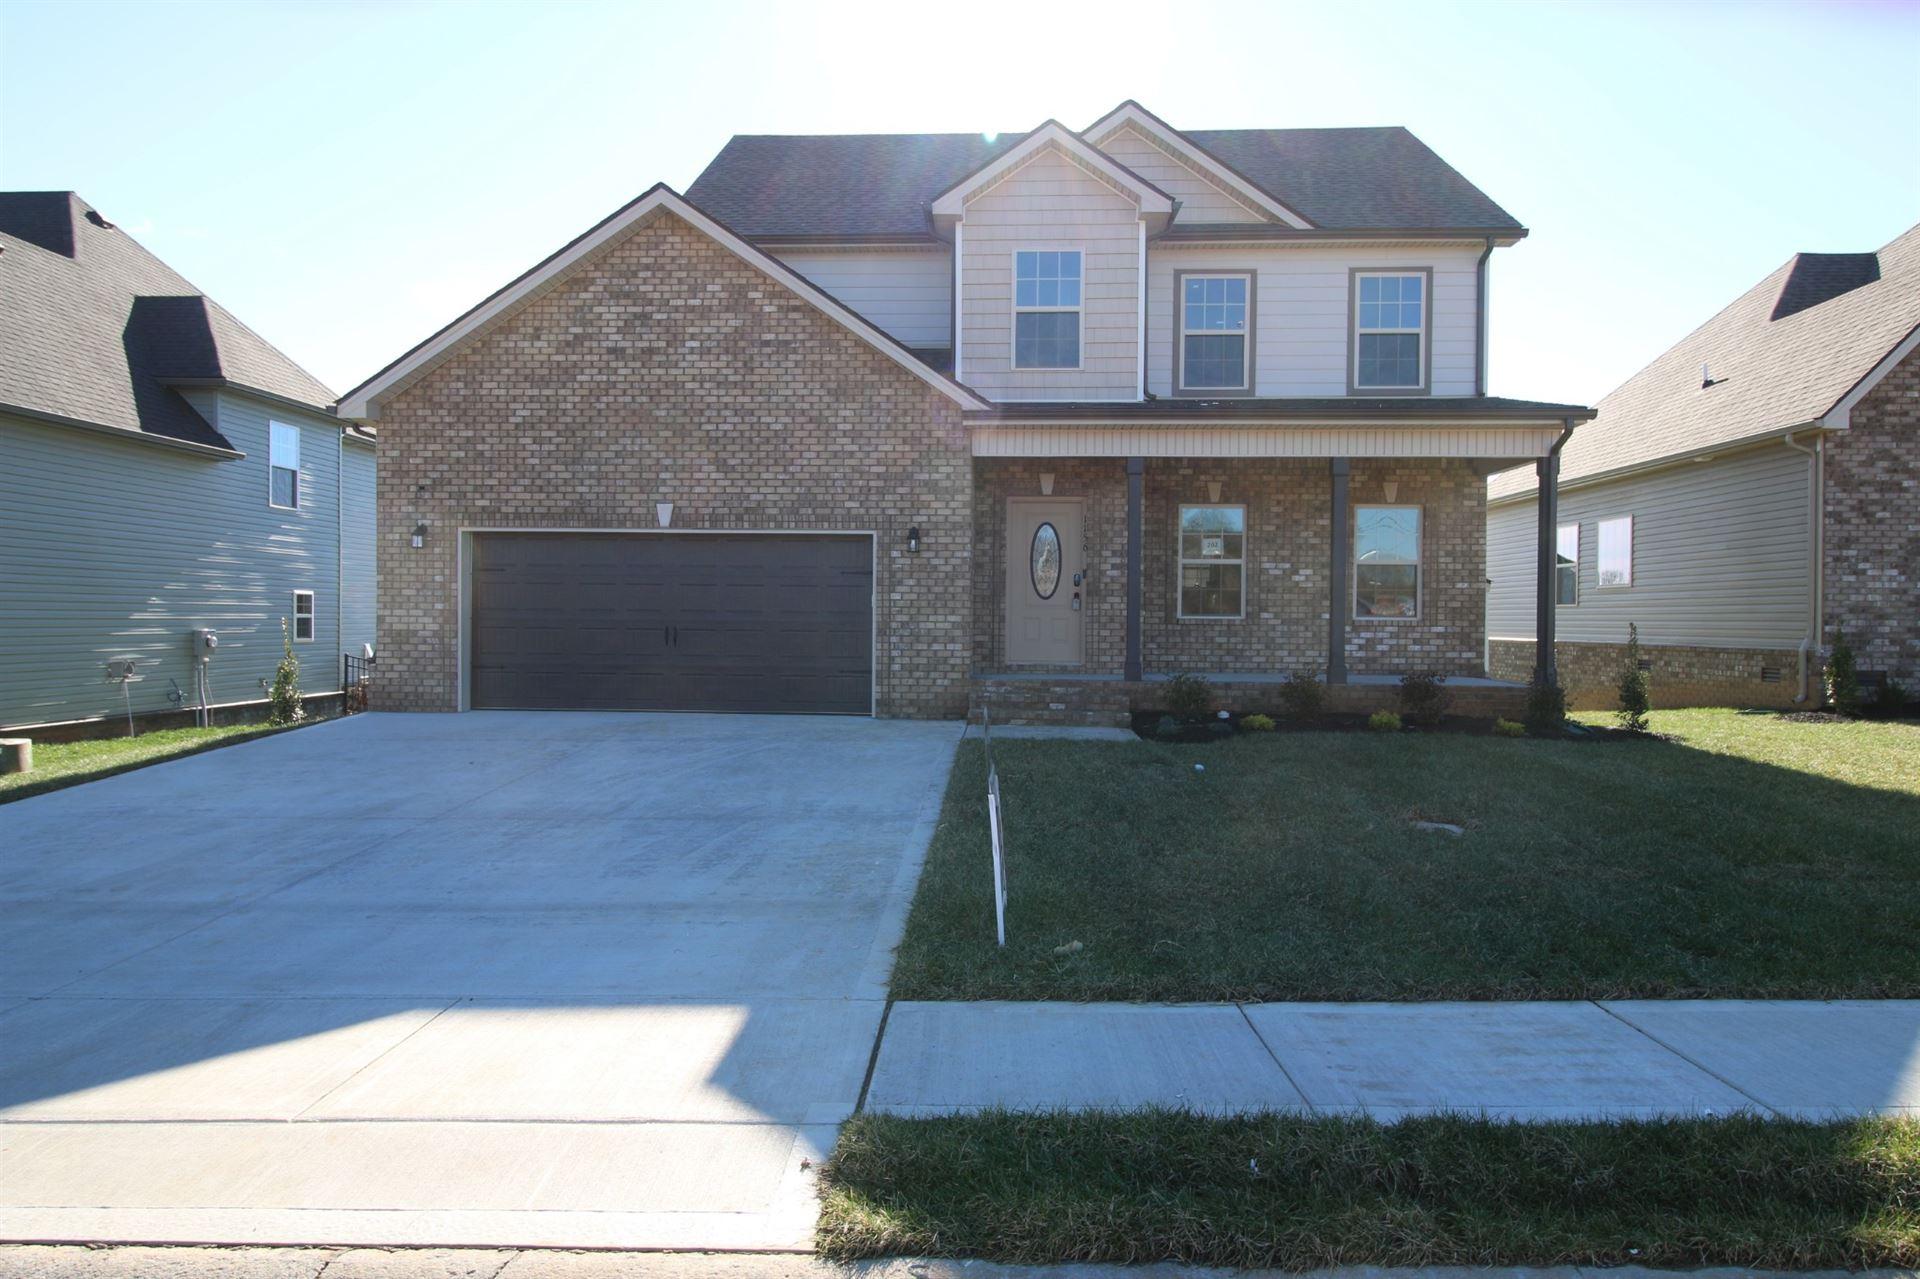 202 Charleston Oaks Reserves, Clarksville, TN 37042 - MLS#: 2292850